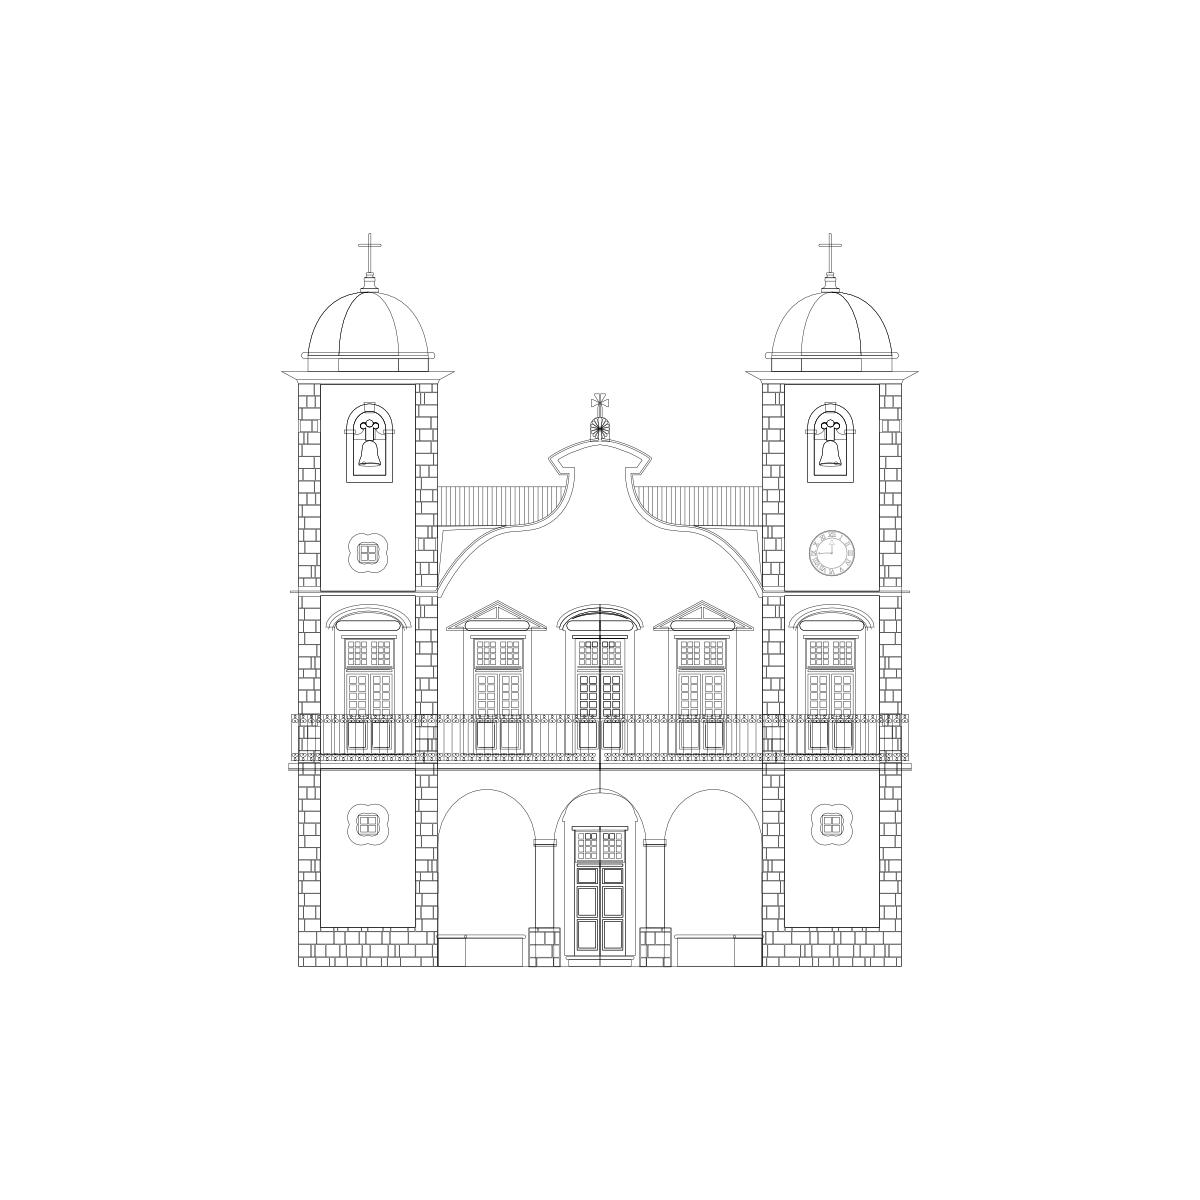 927_igreja_outline